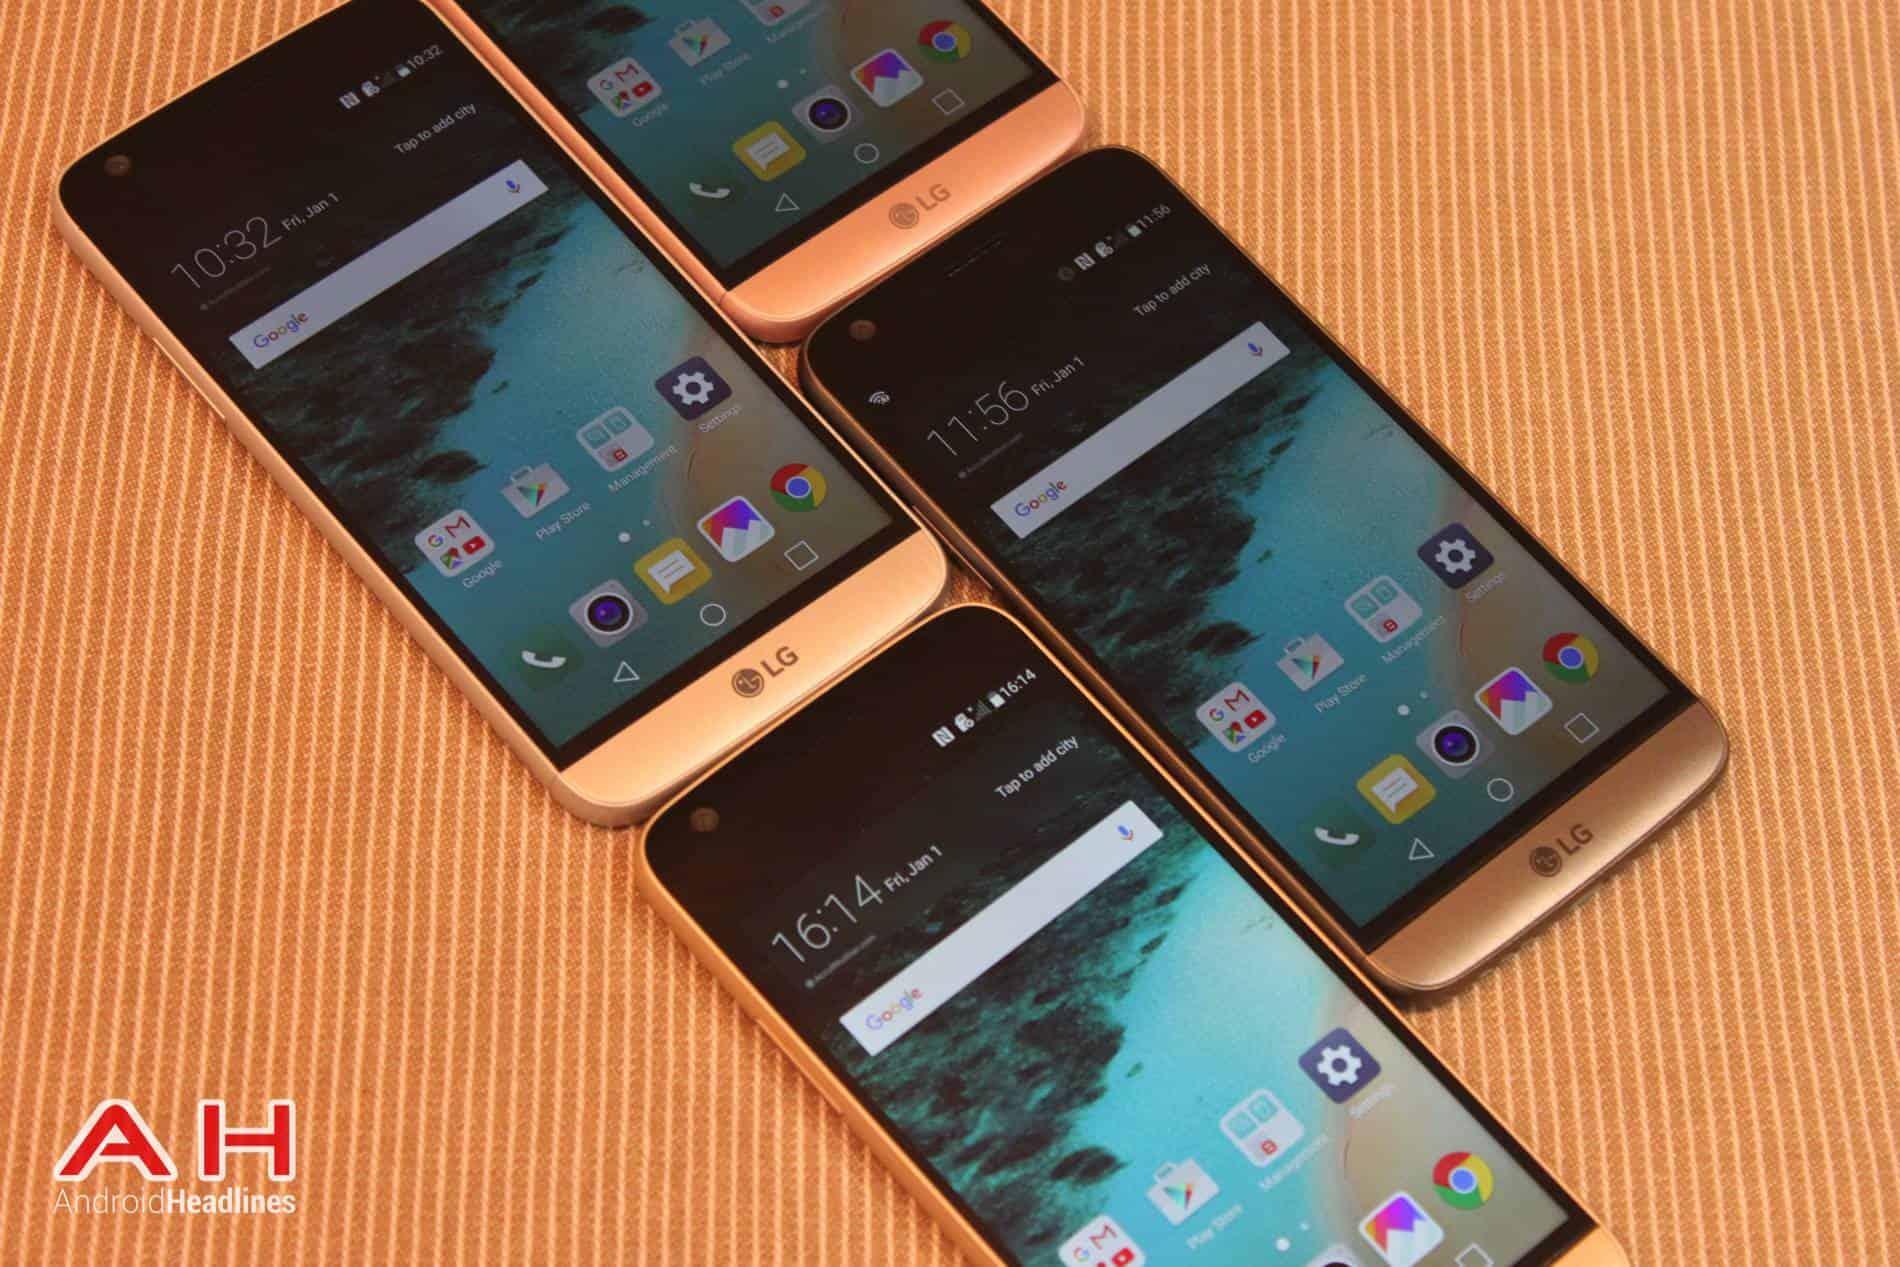 LG G5 Heading To Latin America With 3GB RAM & Snapdragon 652